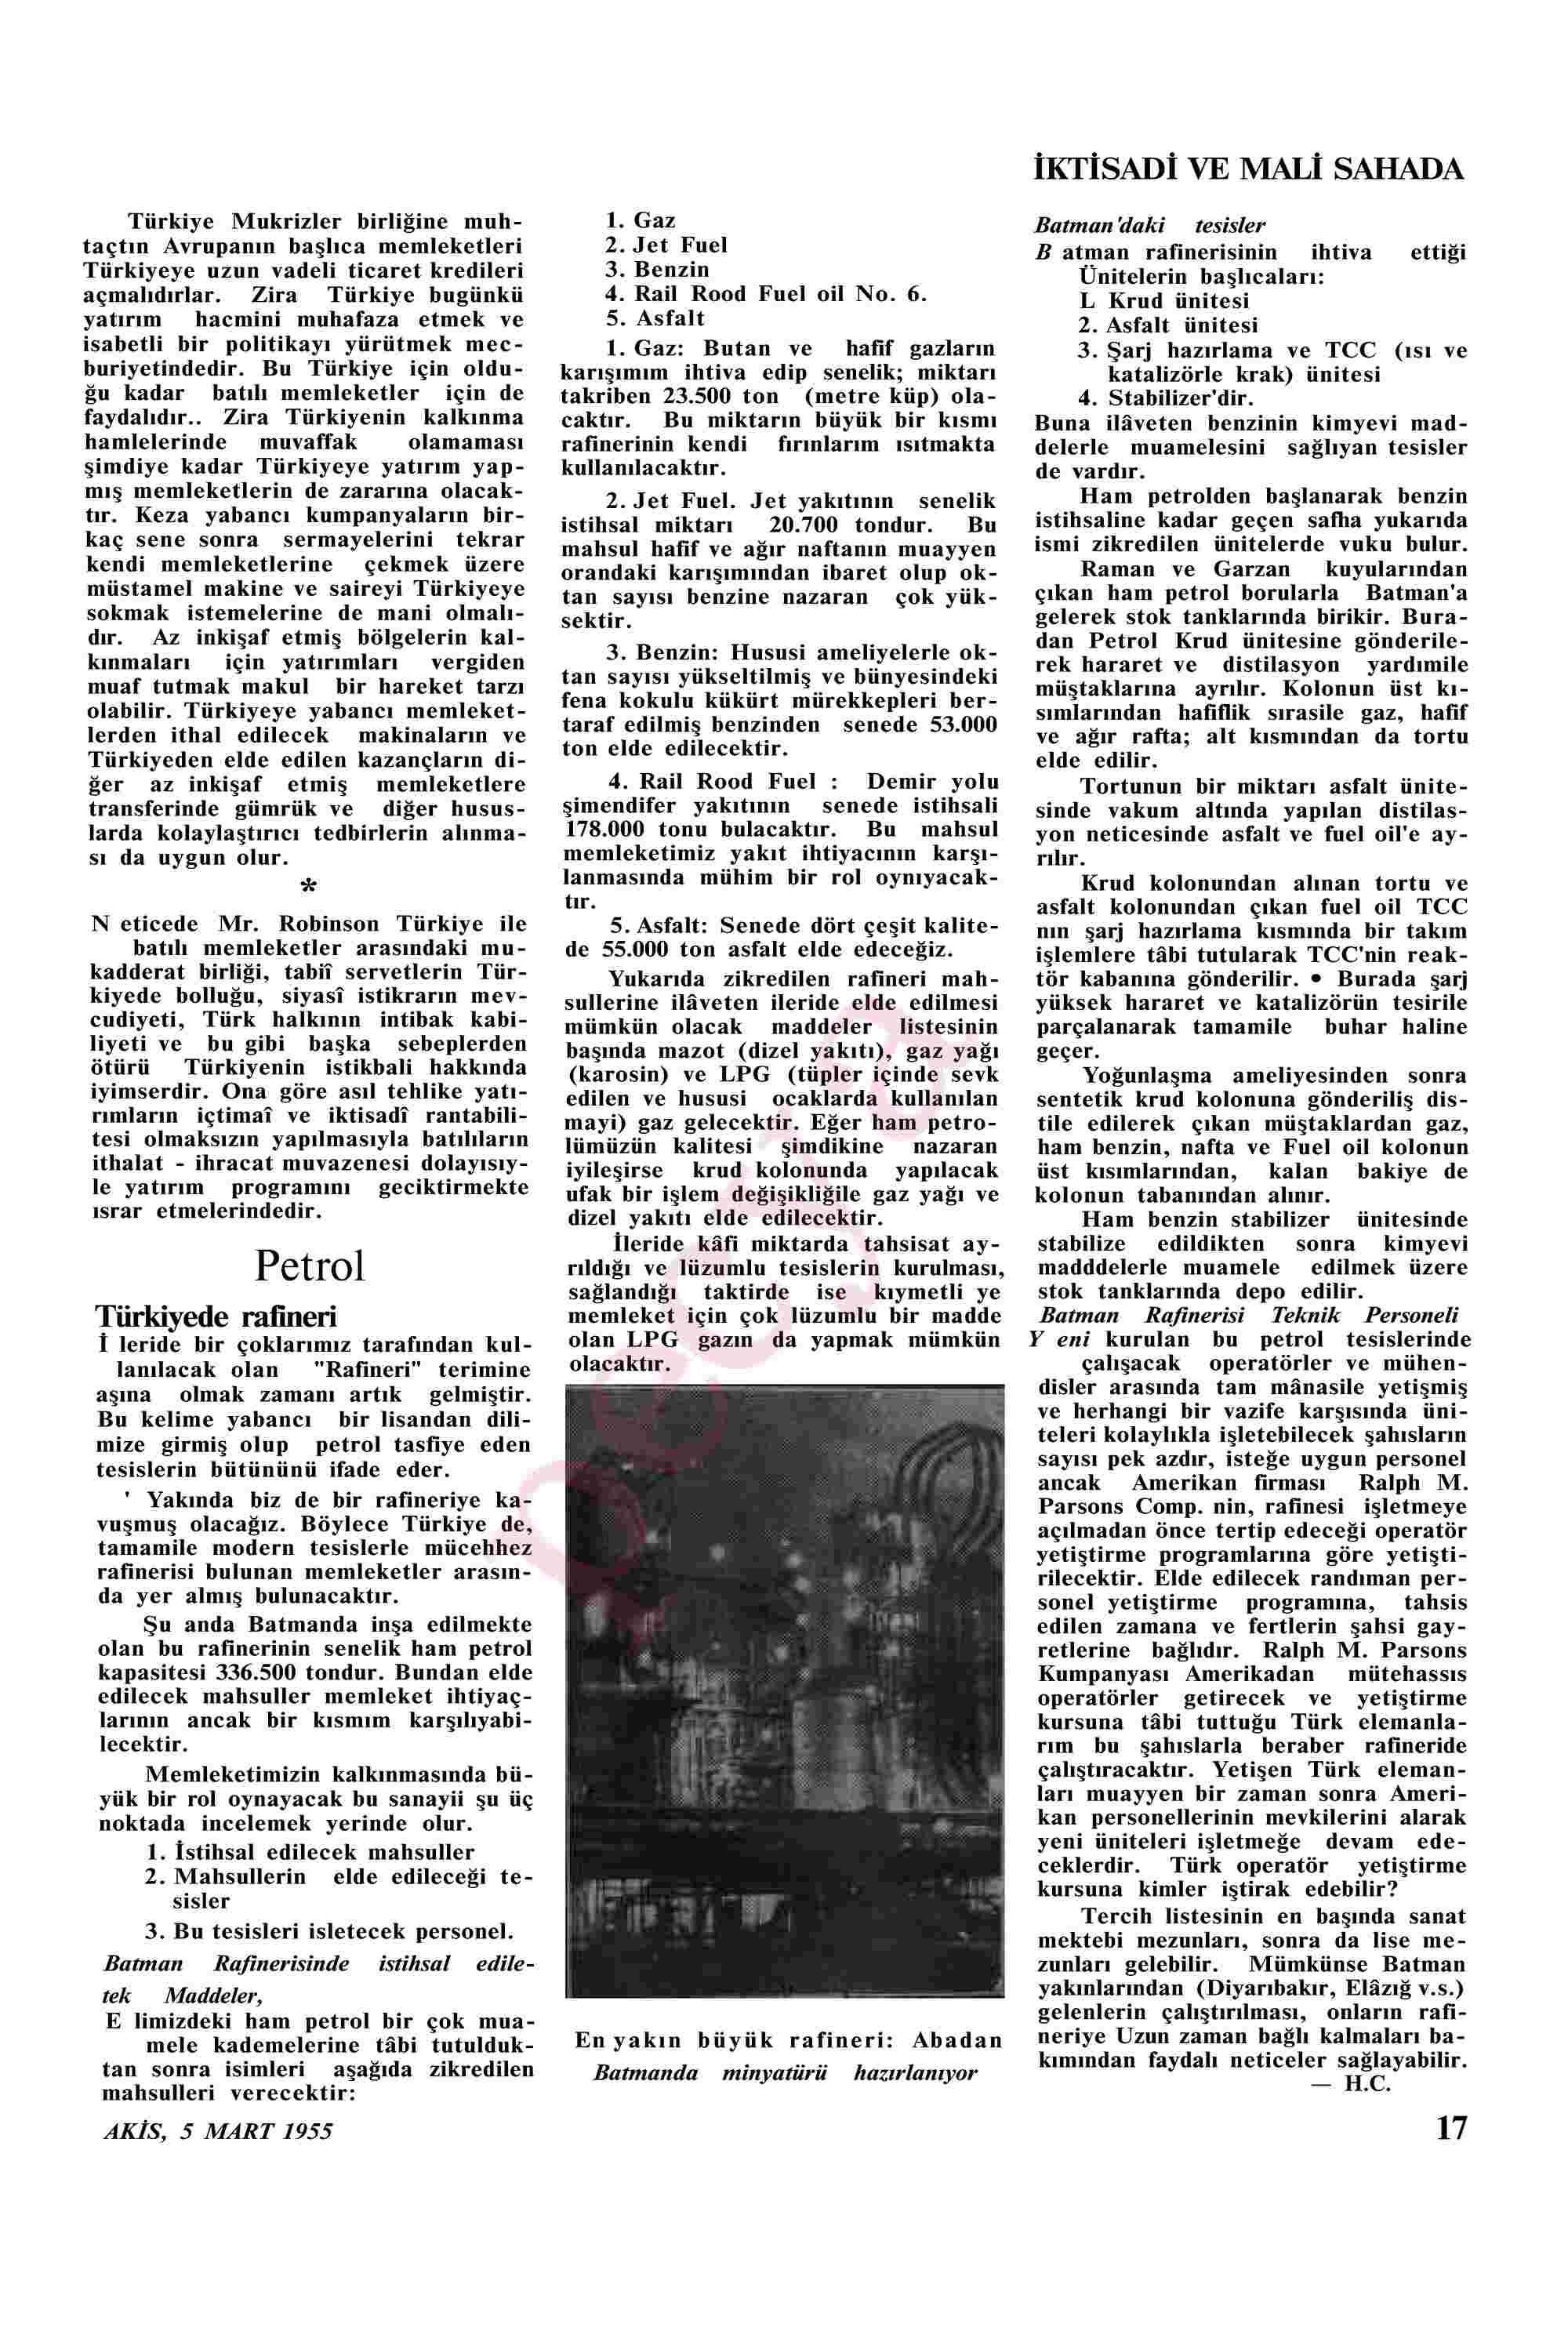 5 Mart 1955 Tarihli Akis Dergisi Sayfa 17